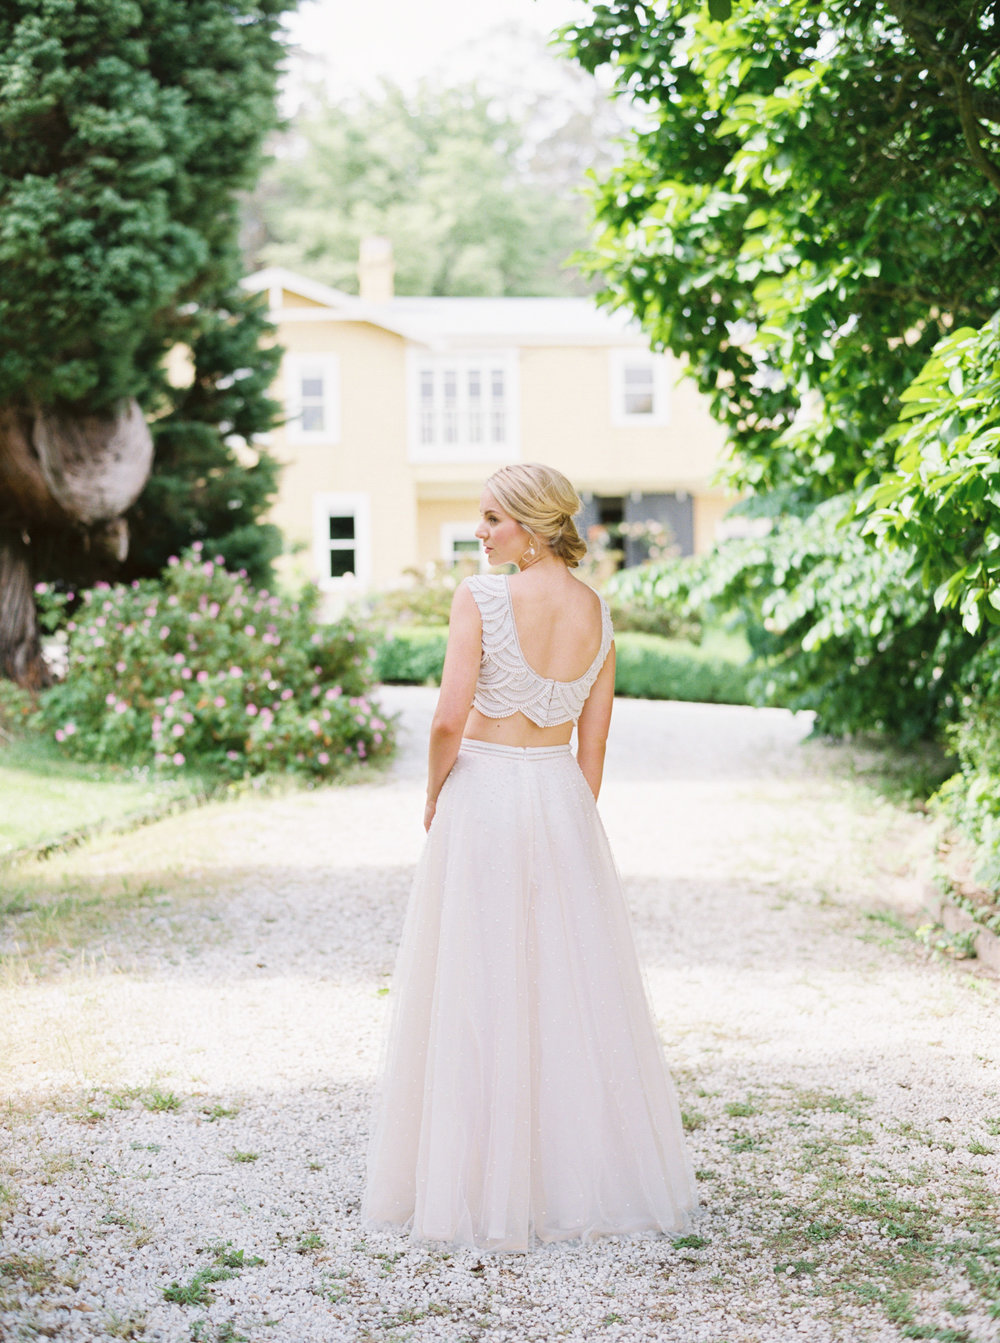 Timeless Southern Highland Wedding Elopement in Bowral NSW Fine Art Film Photographer Sheri McMahon-27.jpg